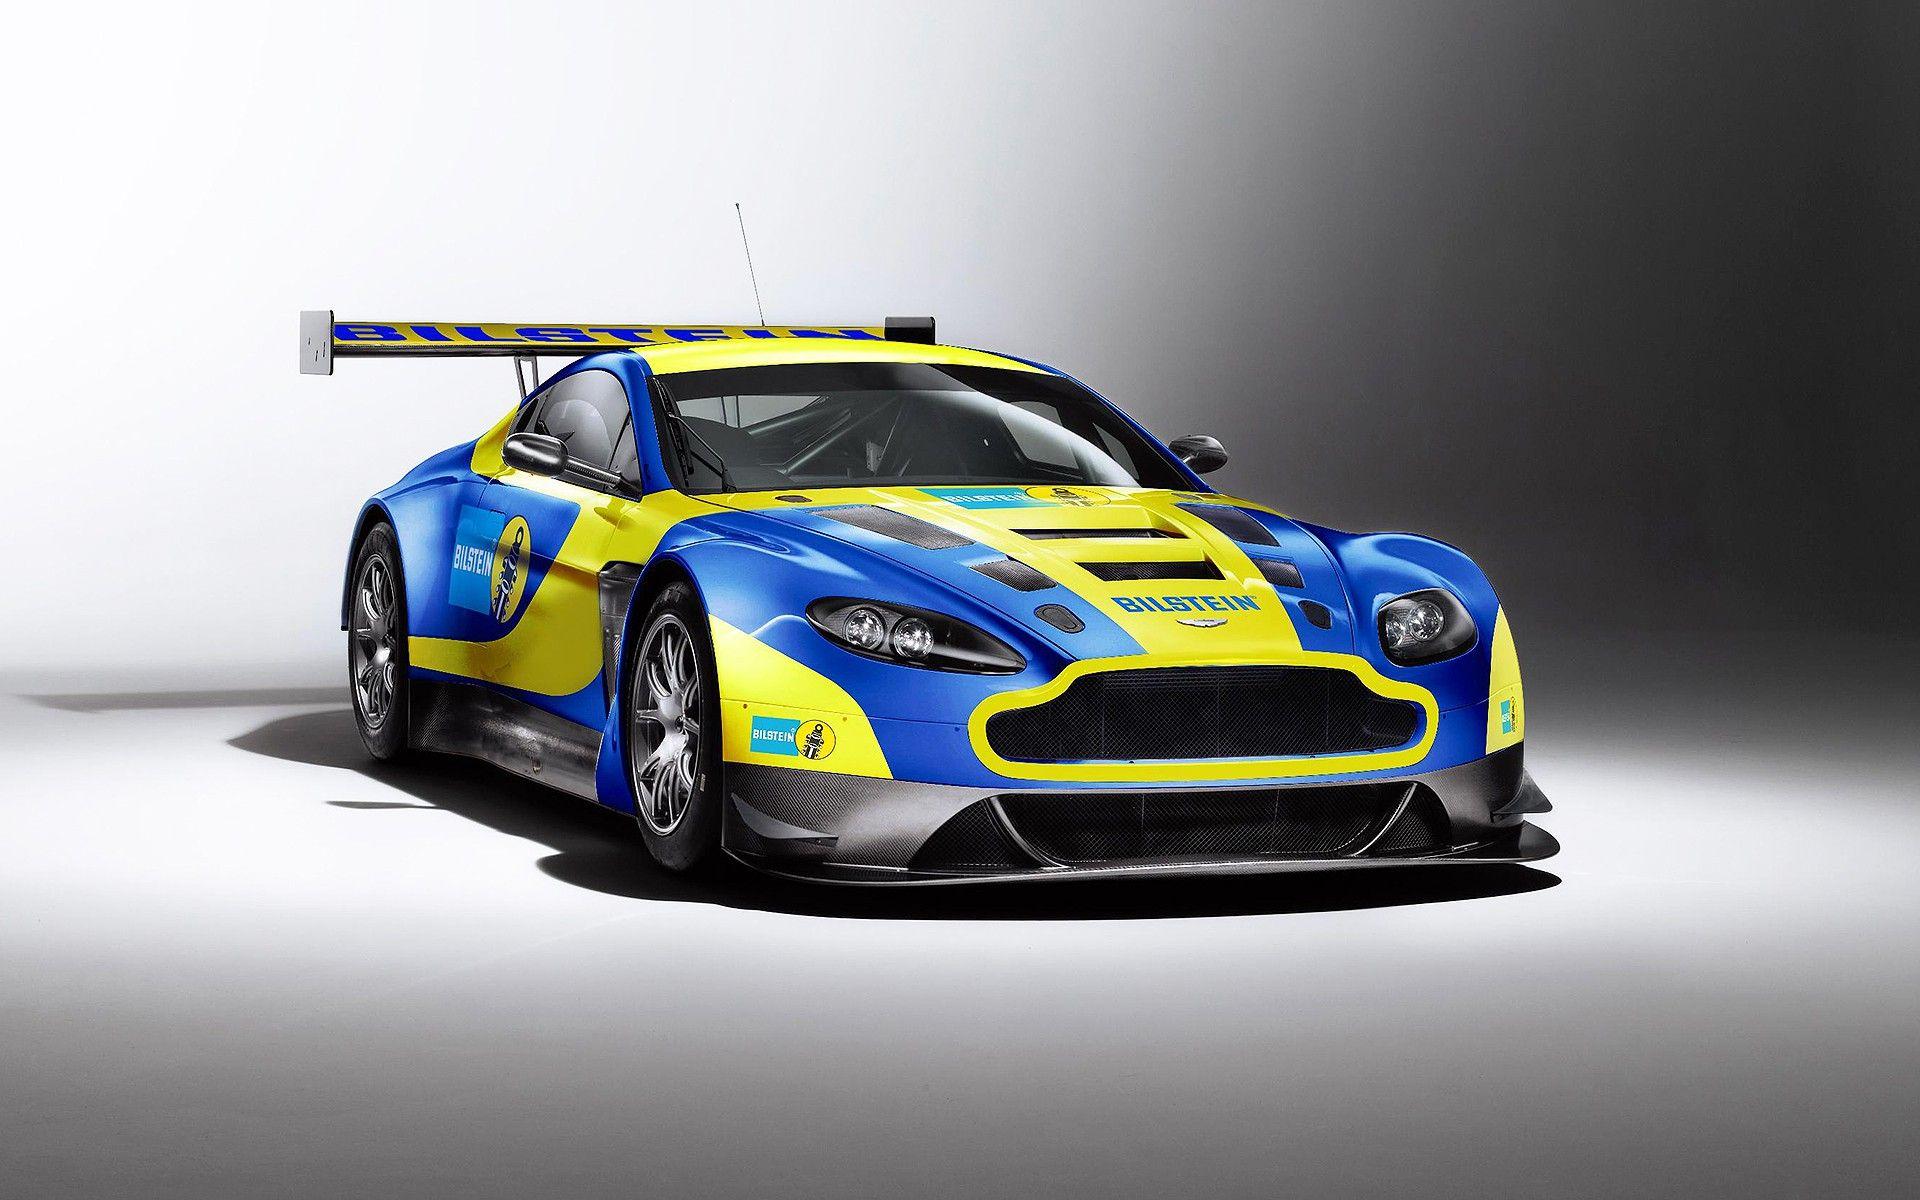 Free download aston martin racing v12 vantage gt3 full hd - Car racing wallpaper free download ...